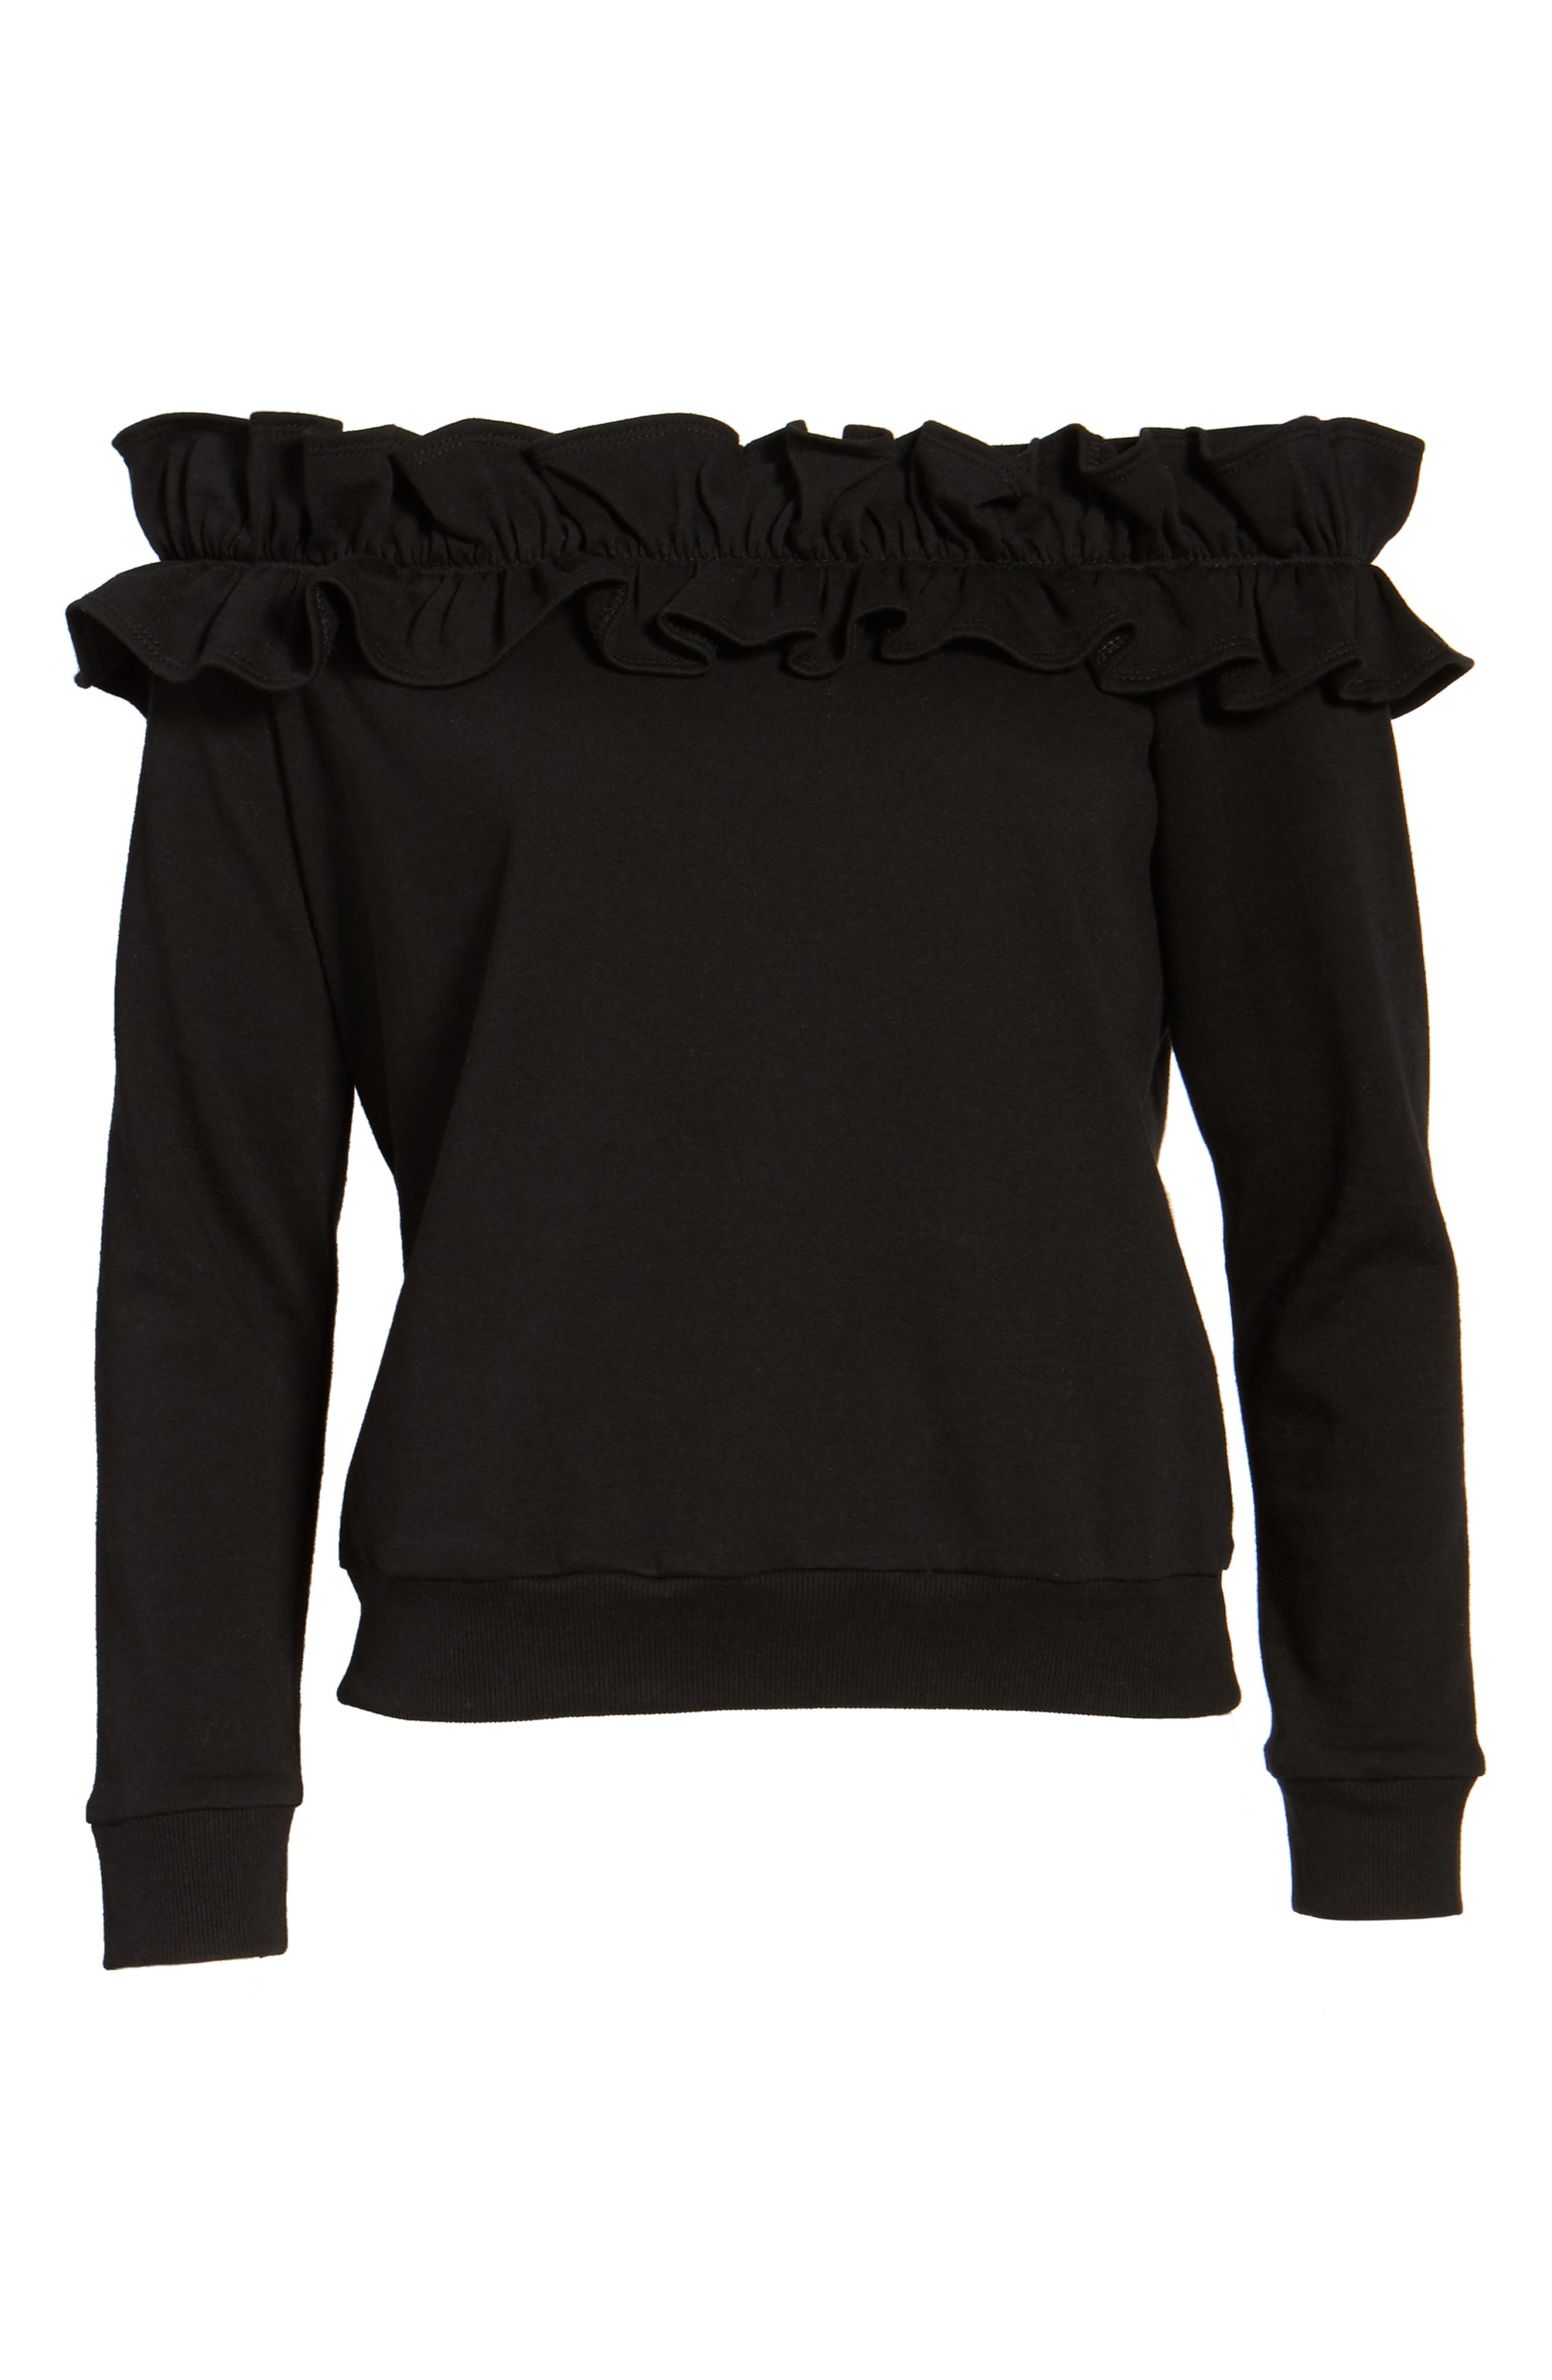 Ruffle Off the Shoulder Top,                         Main,                         color, Black